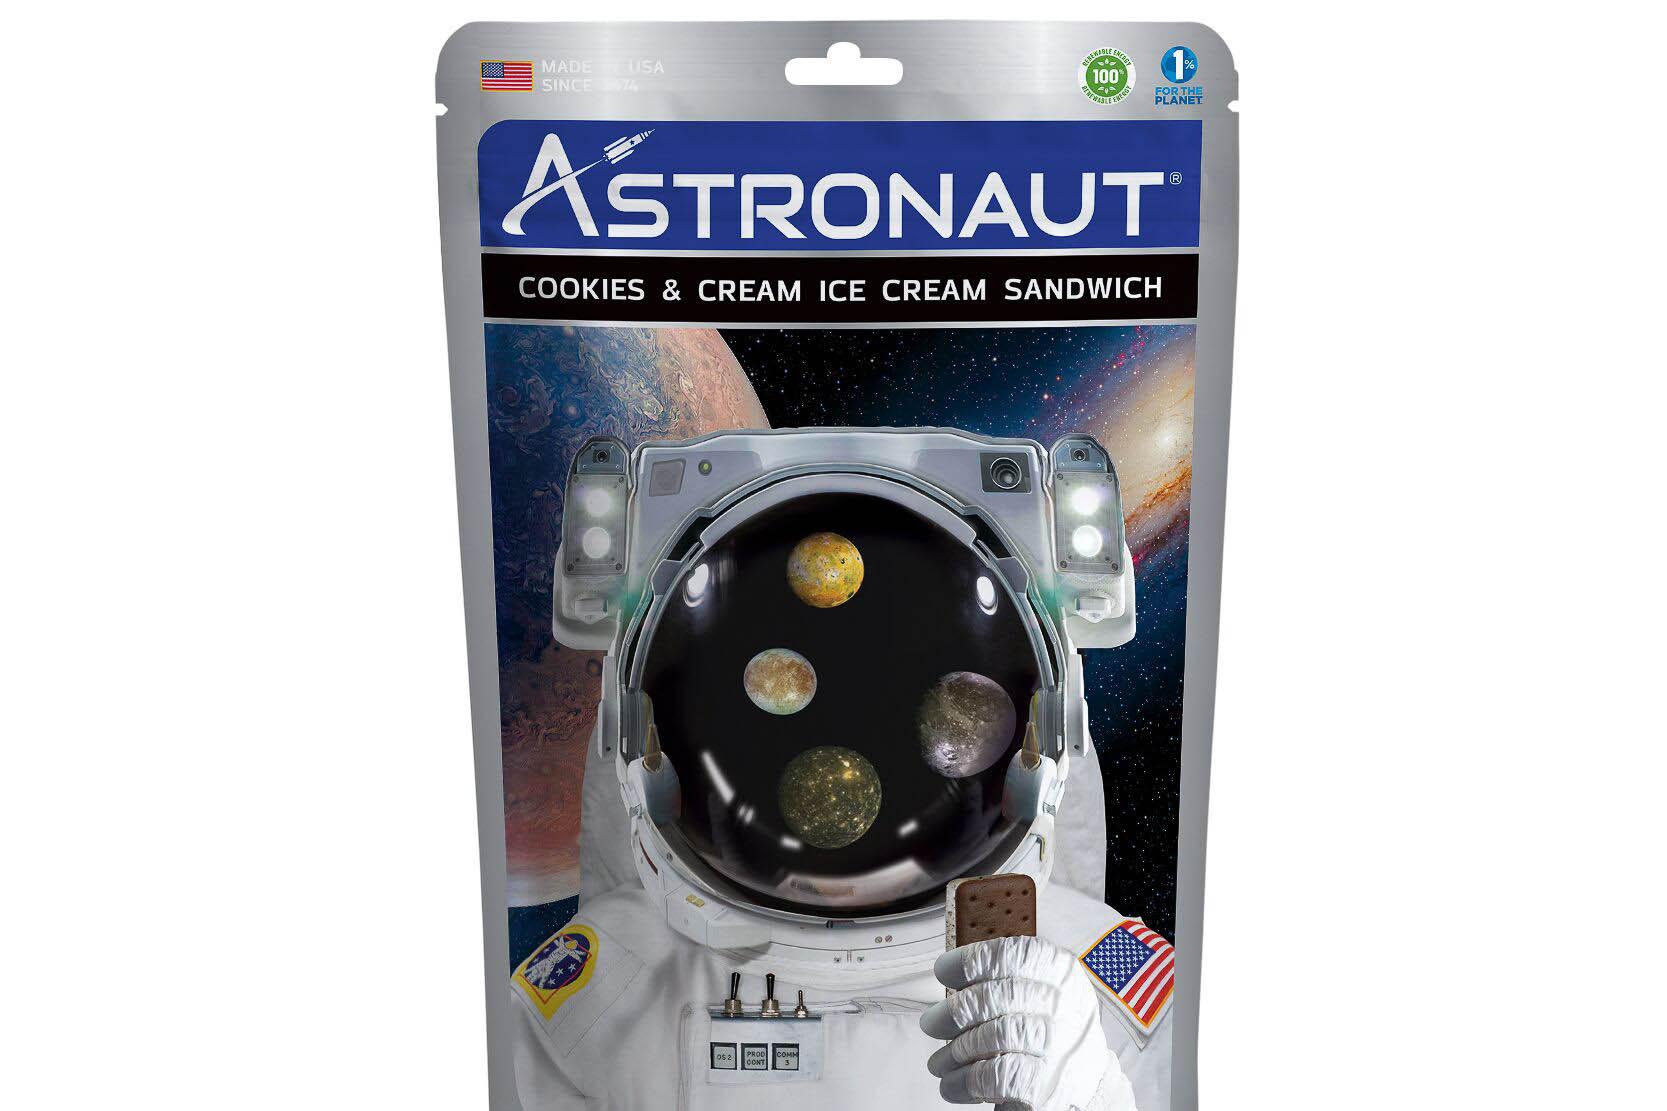 Astronaut Ice Cream Sandwiches